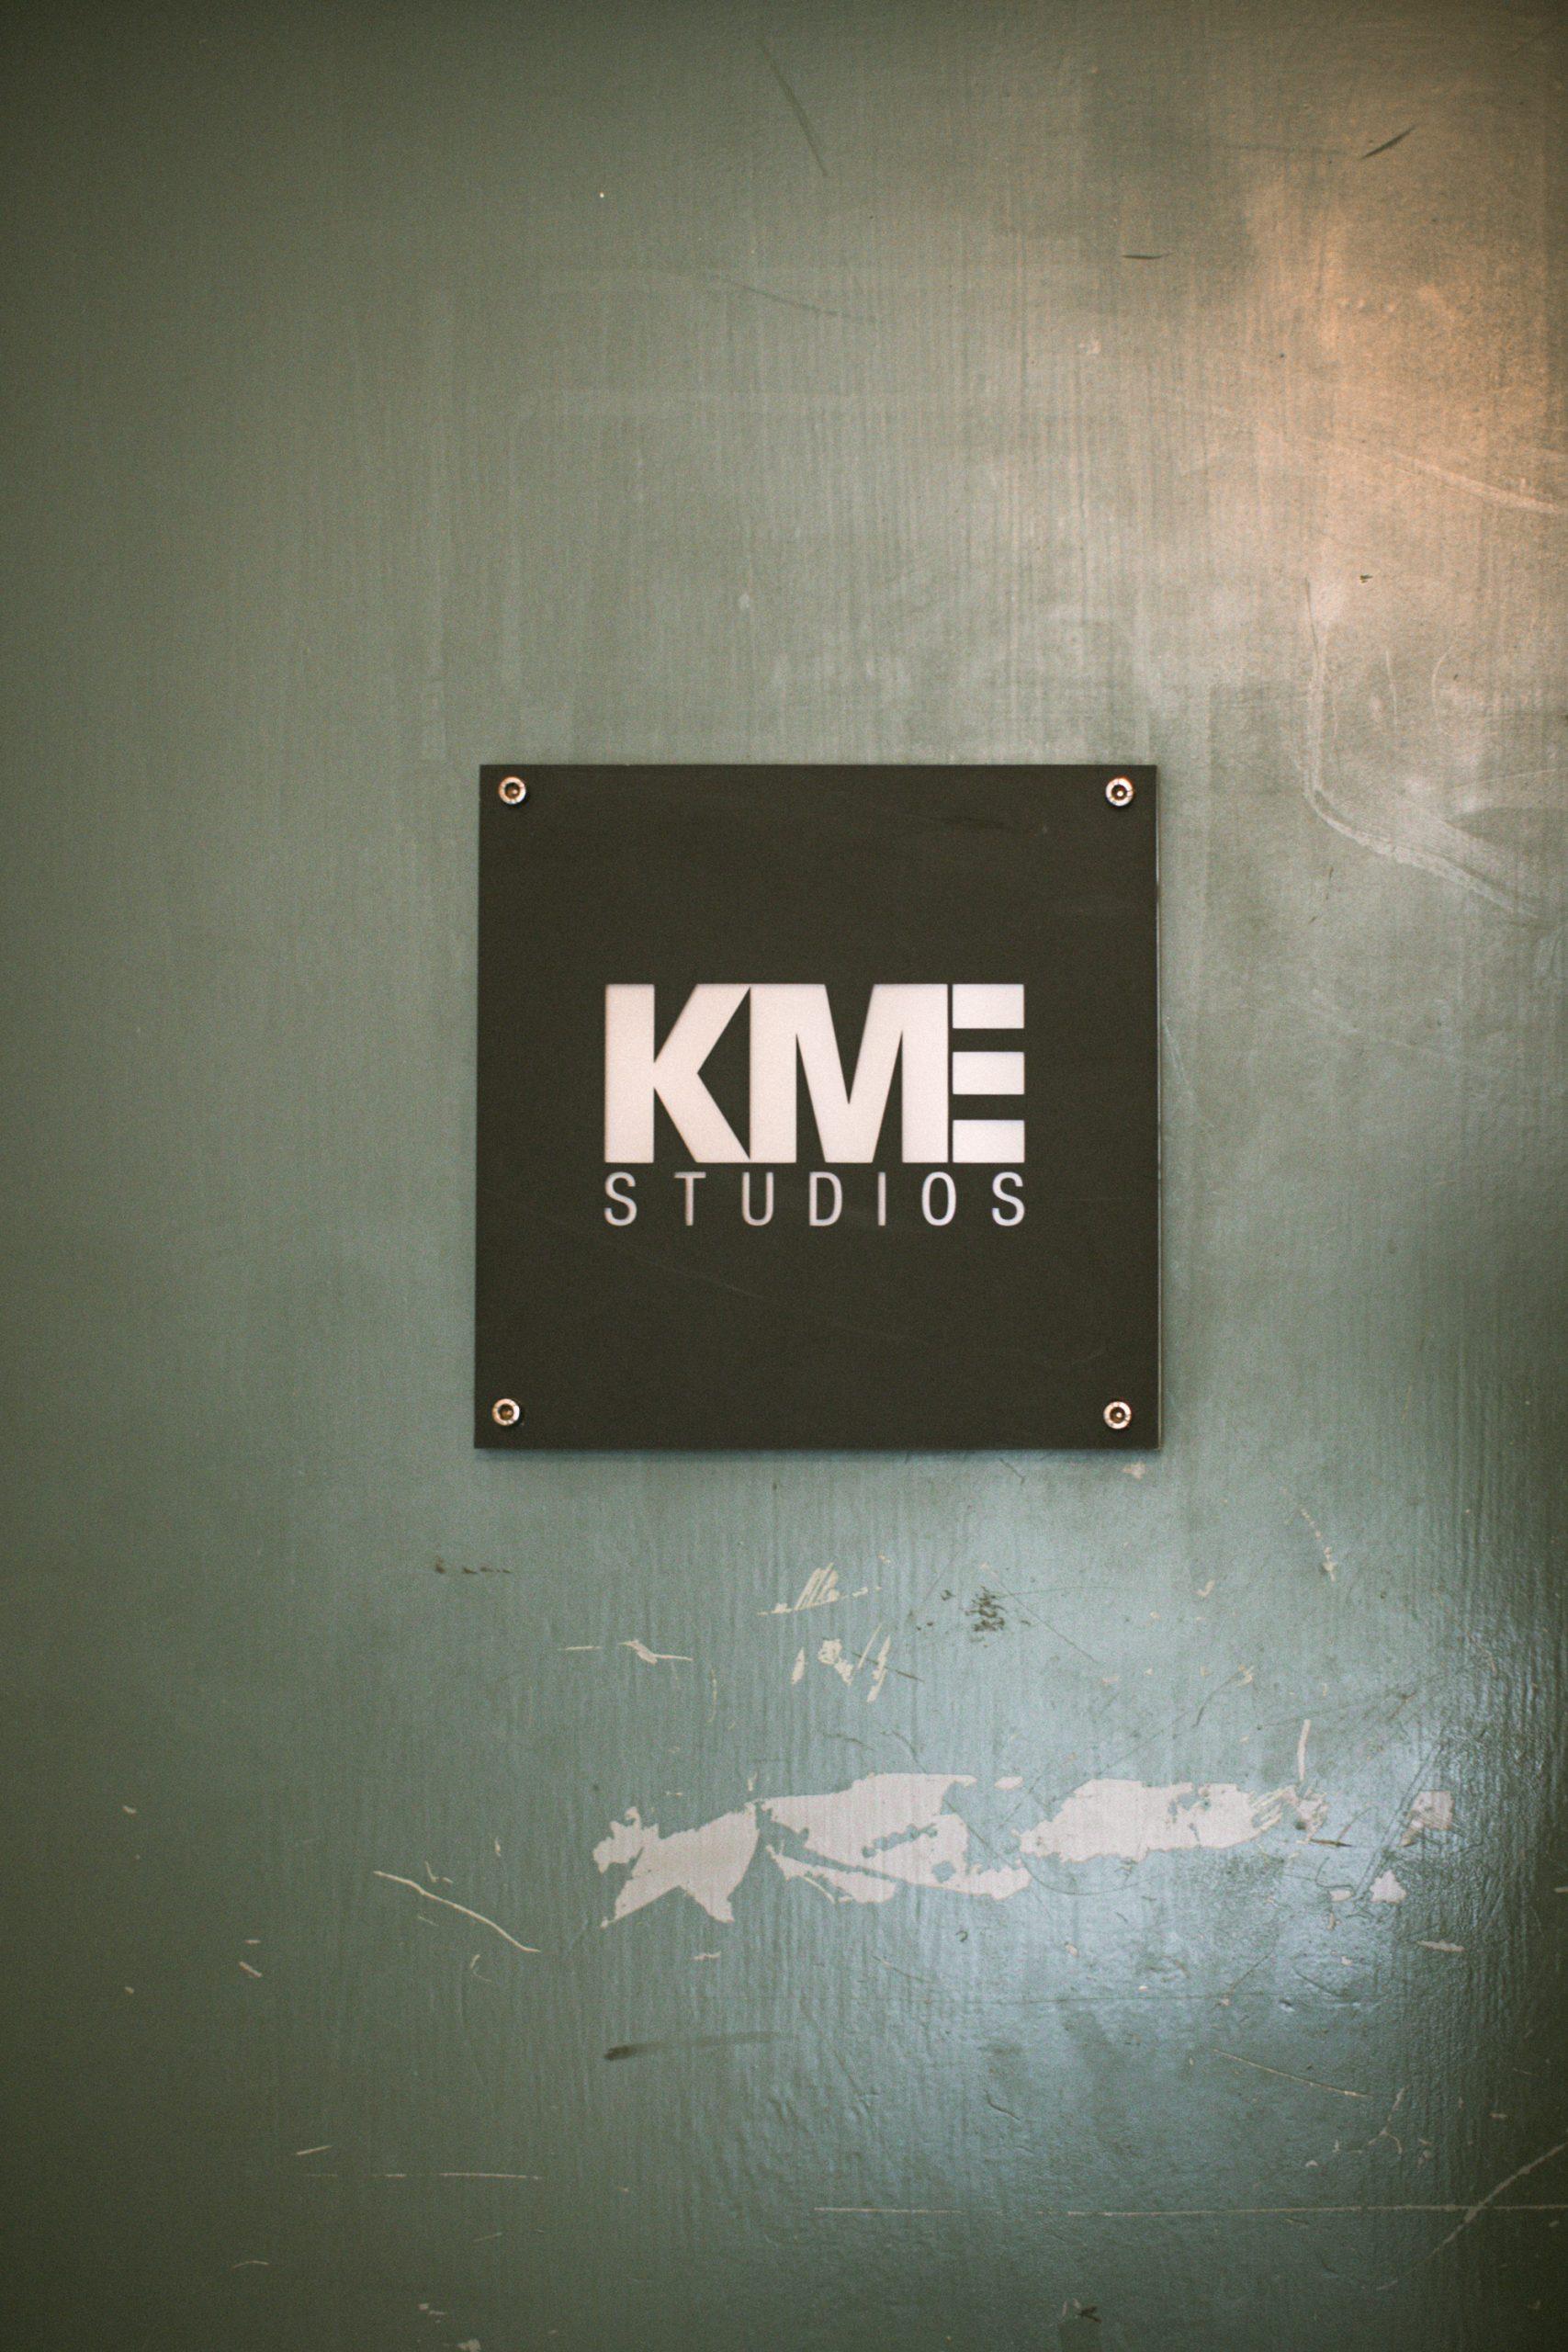 kme-studios-eingangstuer